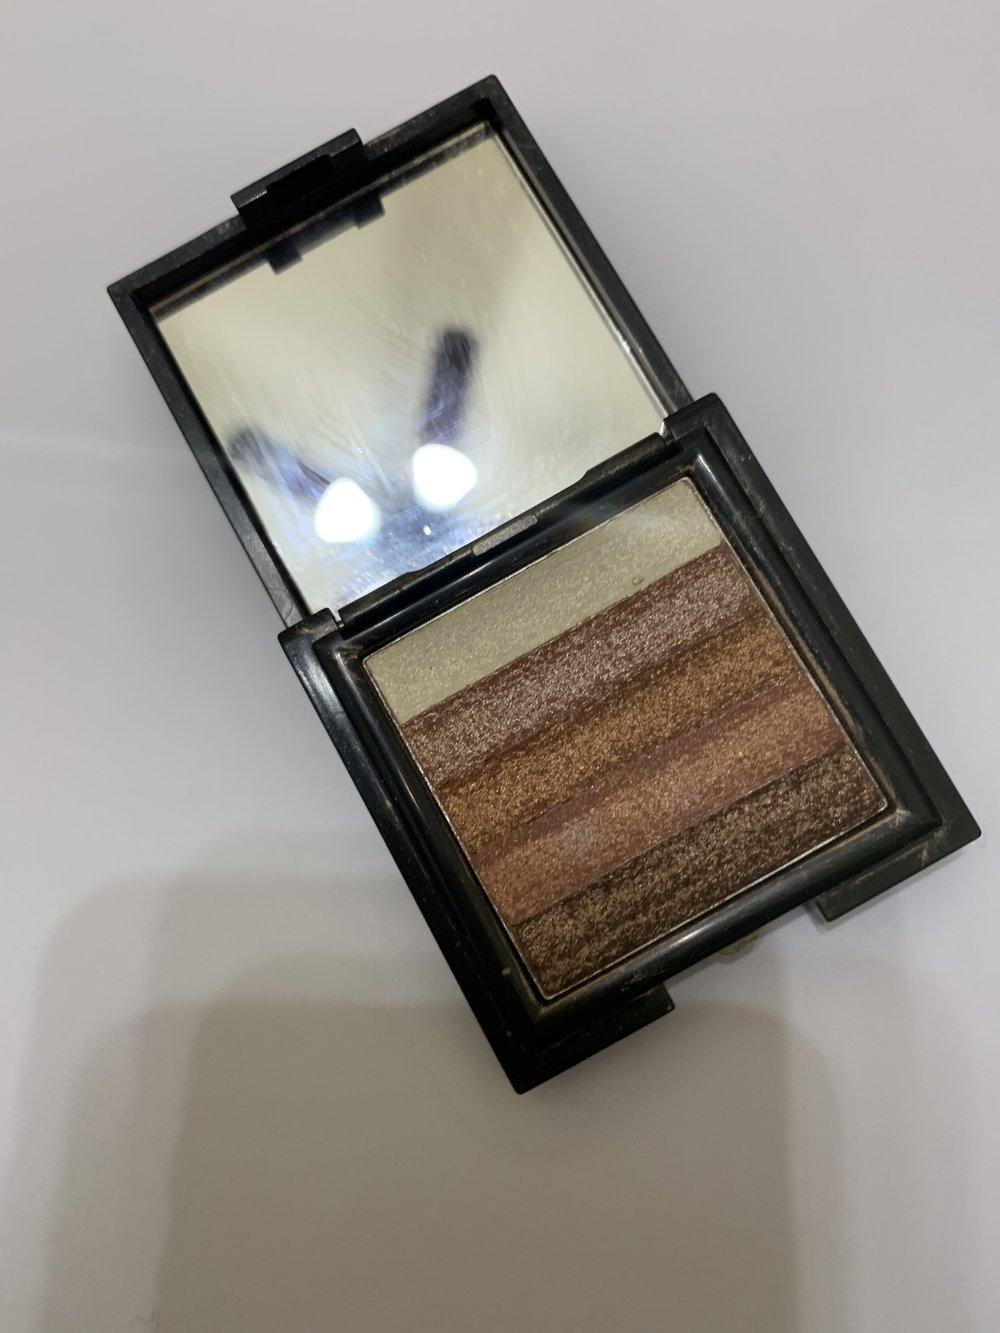 Bobbi Brown Bronze Brick highlighter-$10